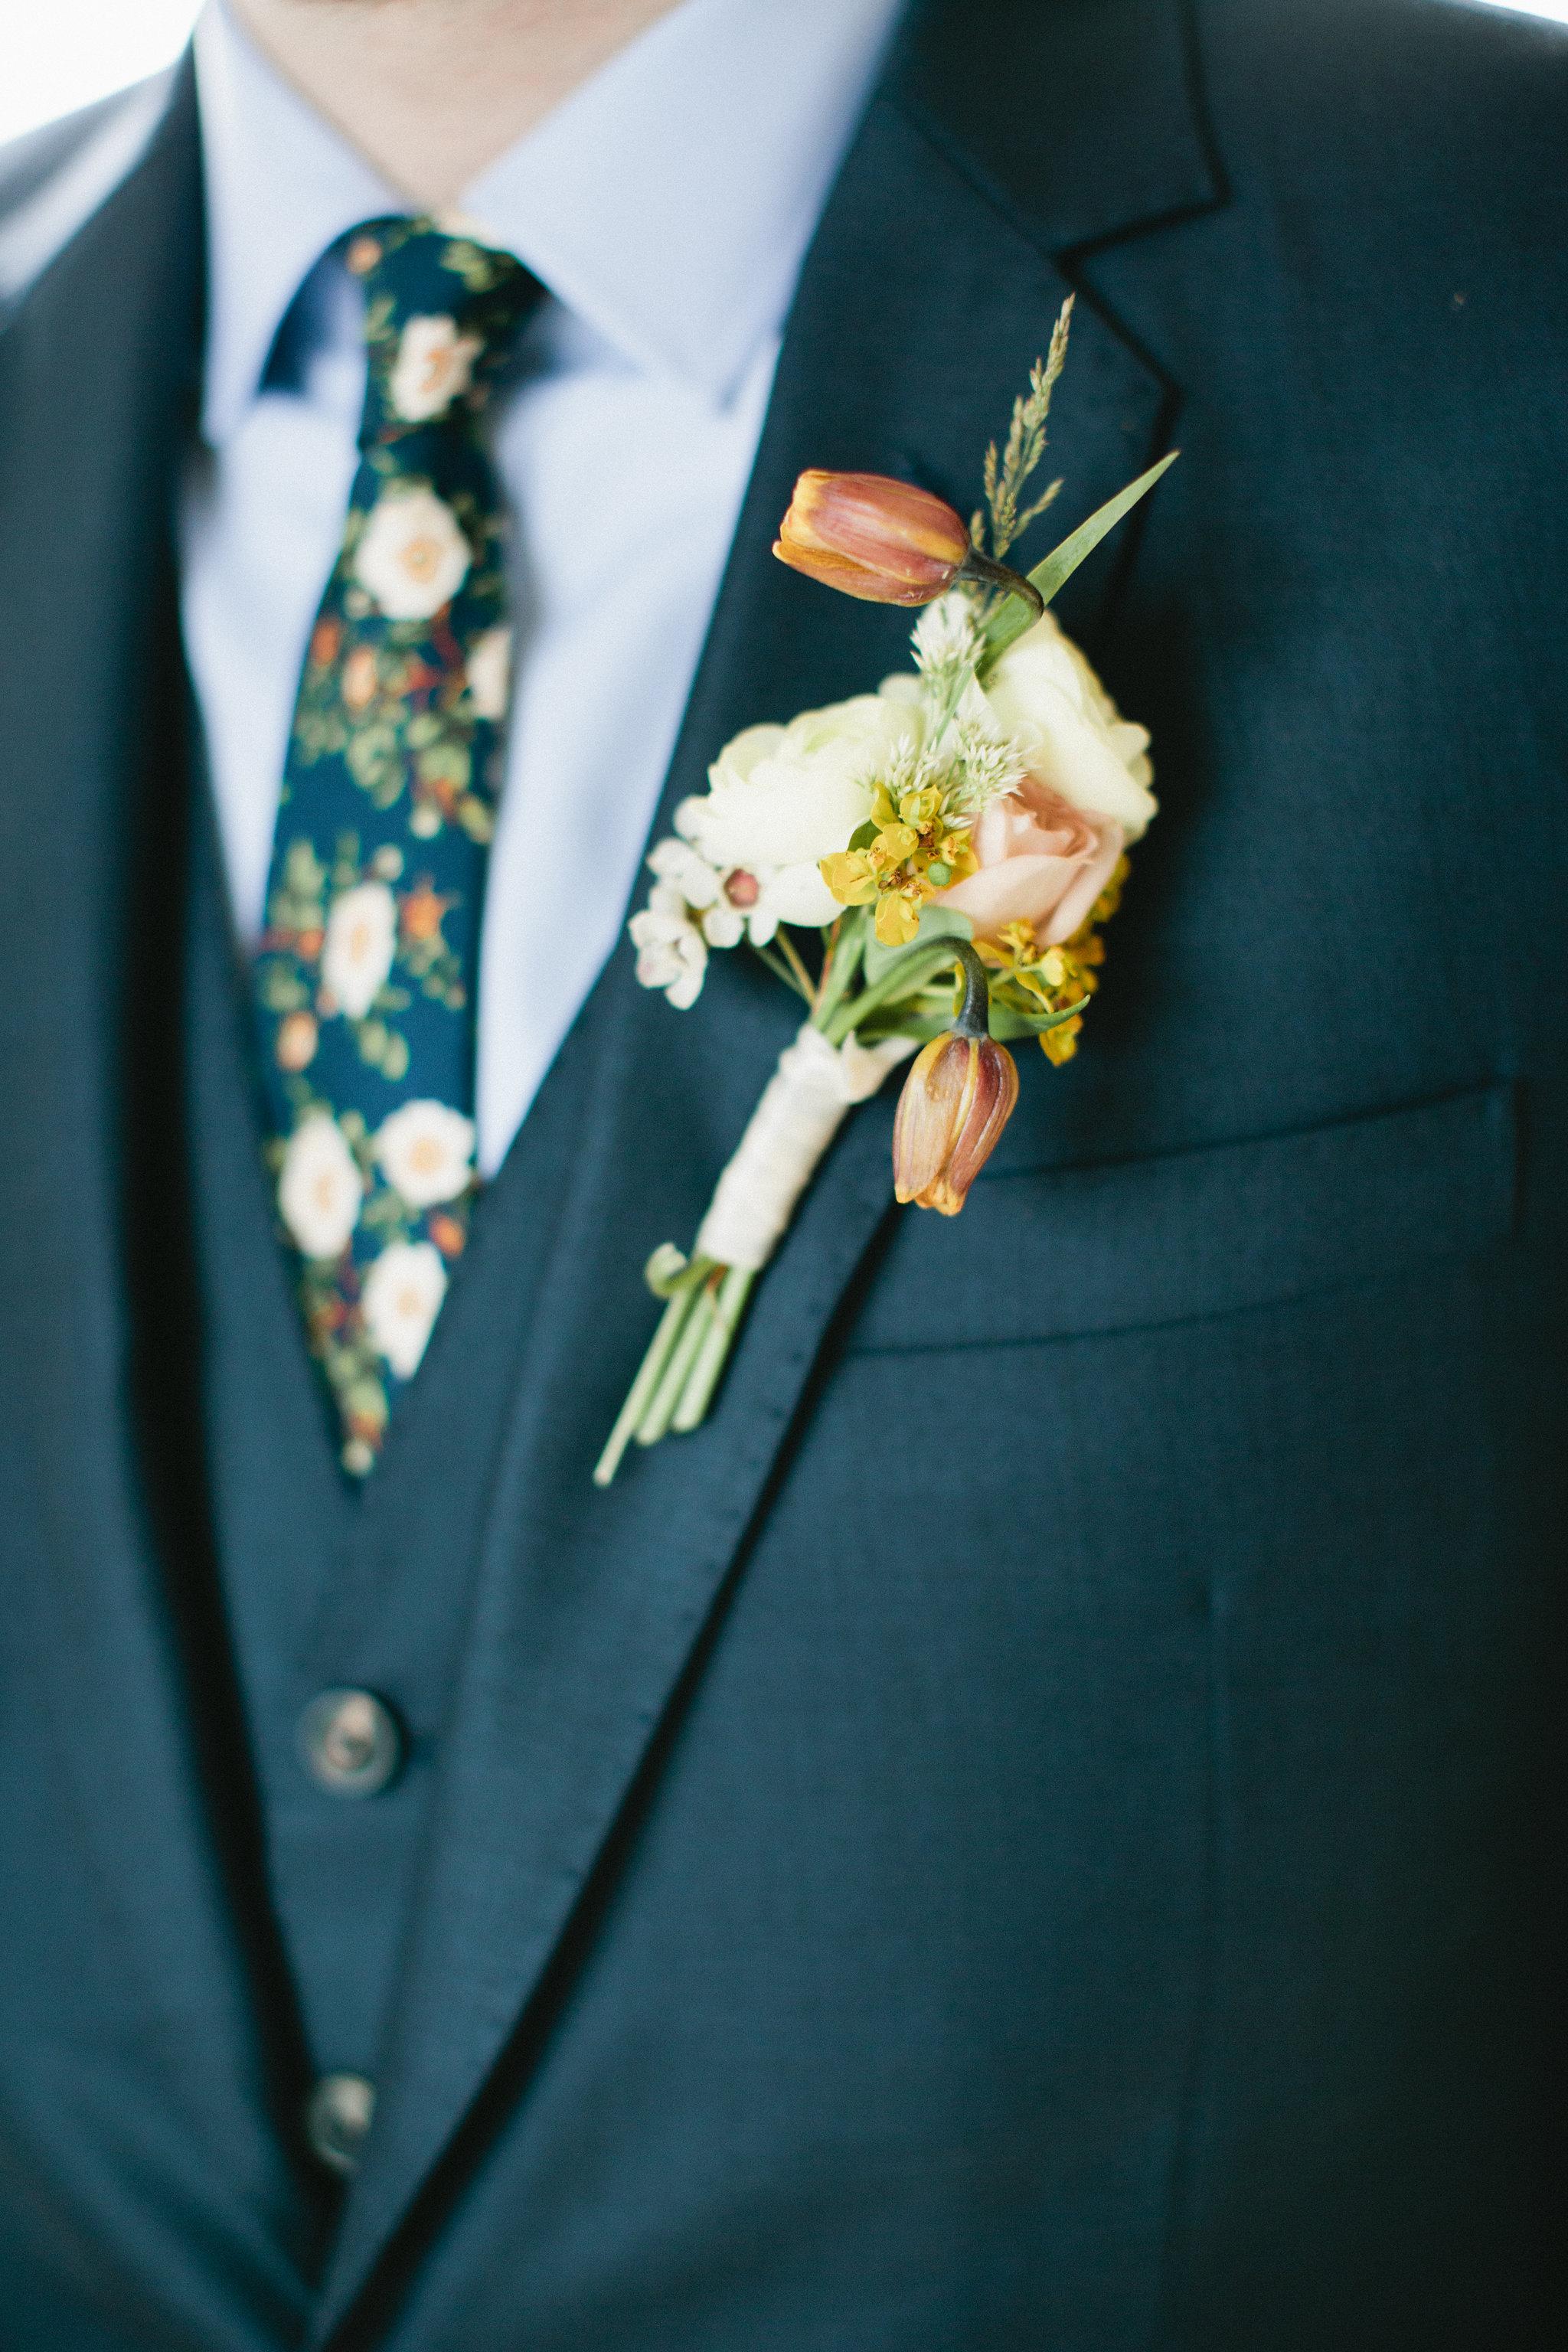 bowery-hotel-wedding-jove-meyer-events-014.jpg